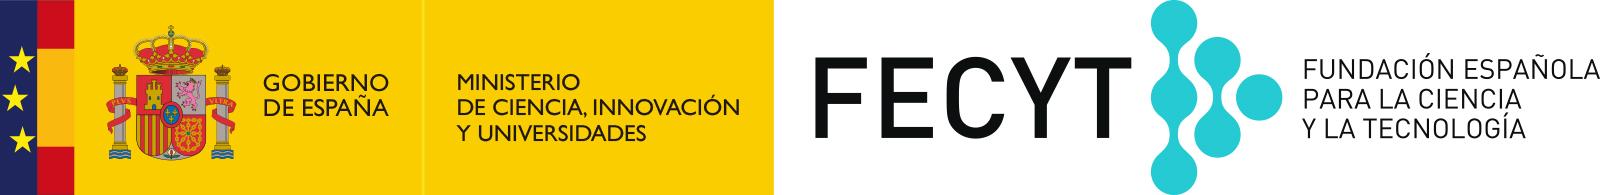 LogoMinisterio-FECYT_Web